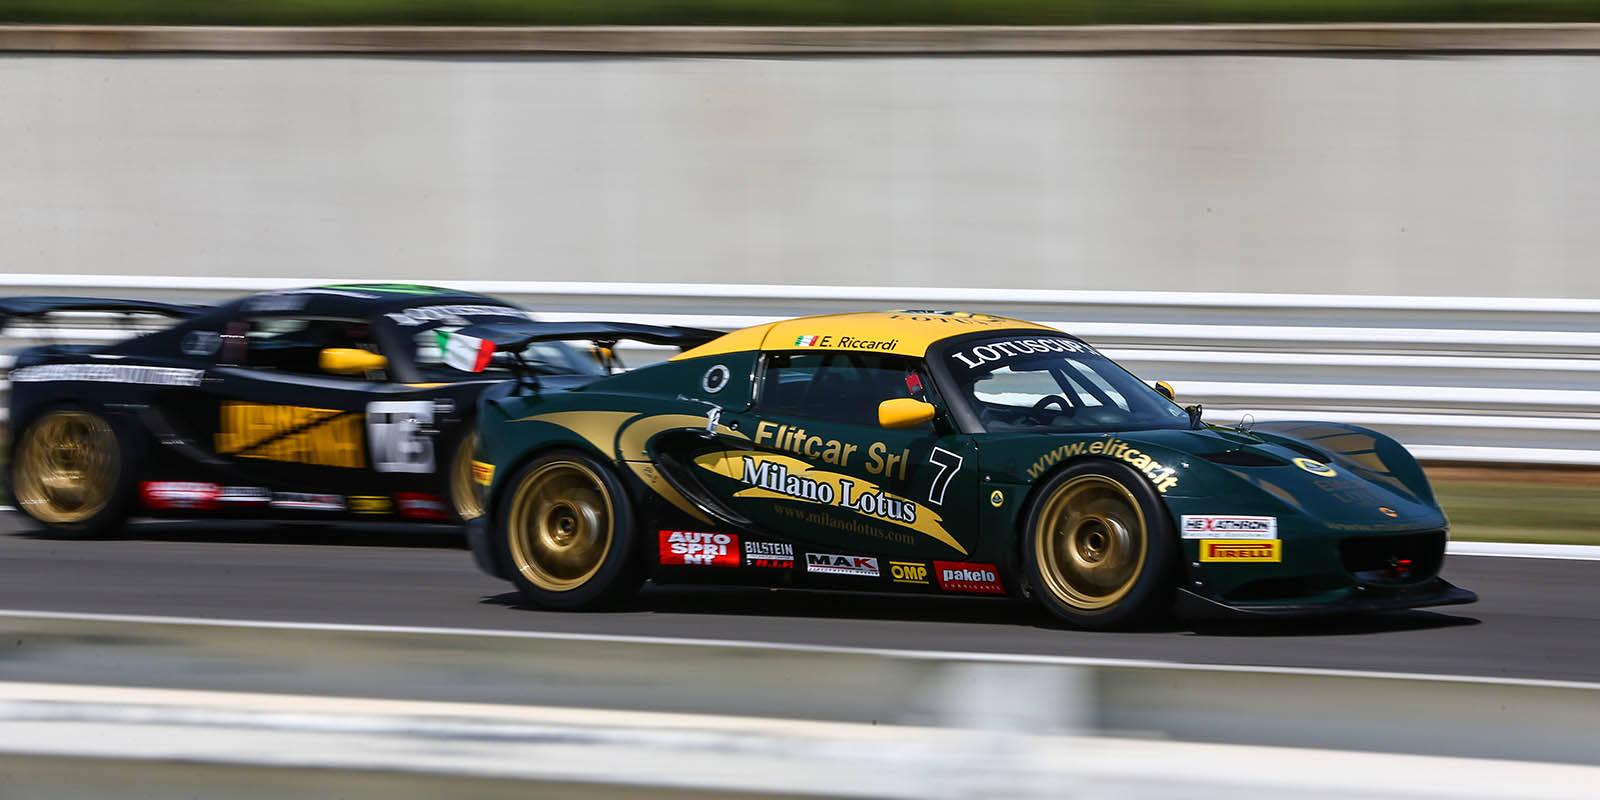 elitcar-racing-lotus-milano-vetture-aziendali-1